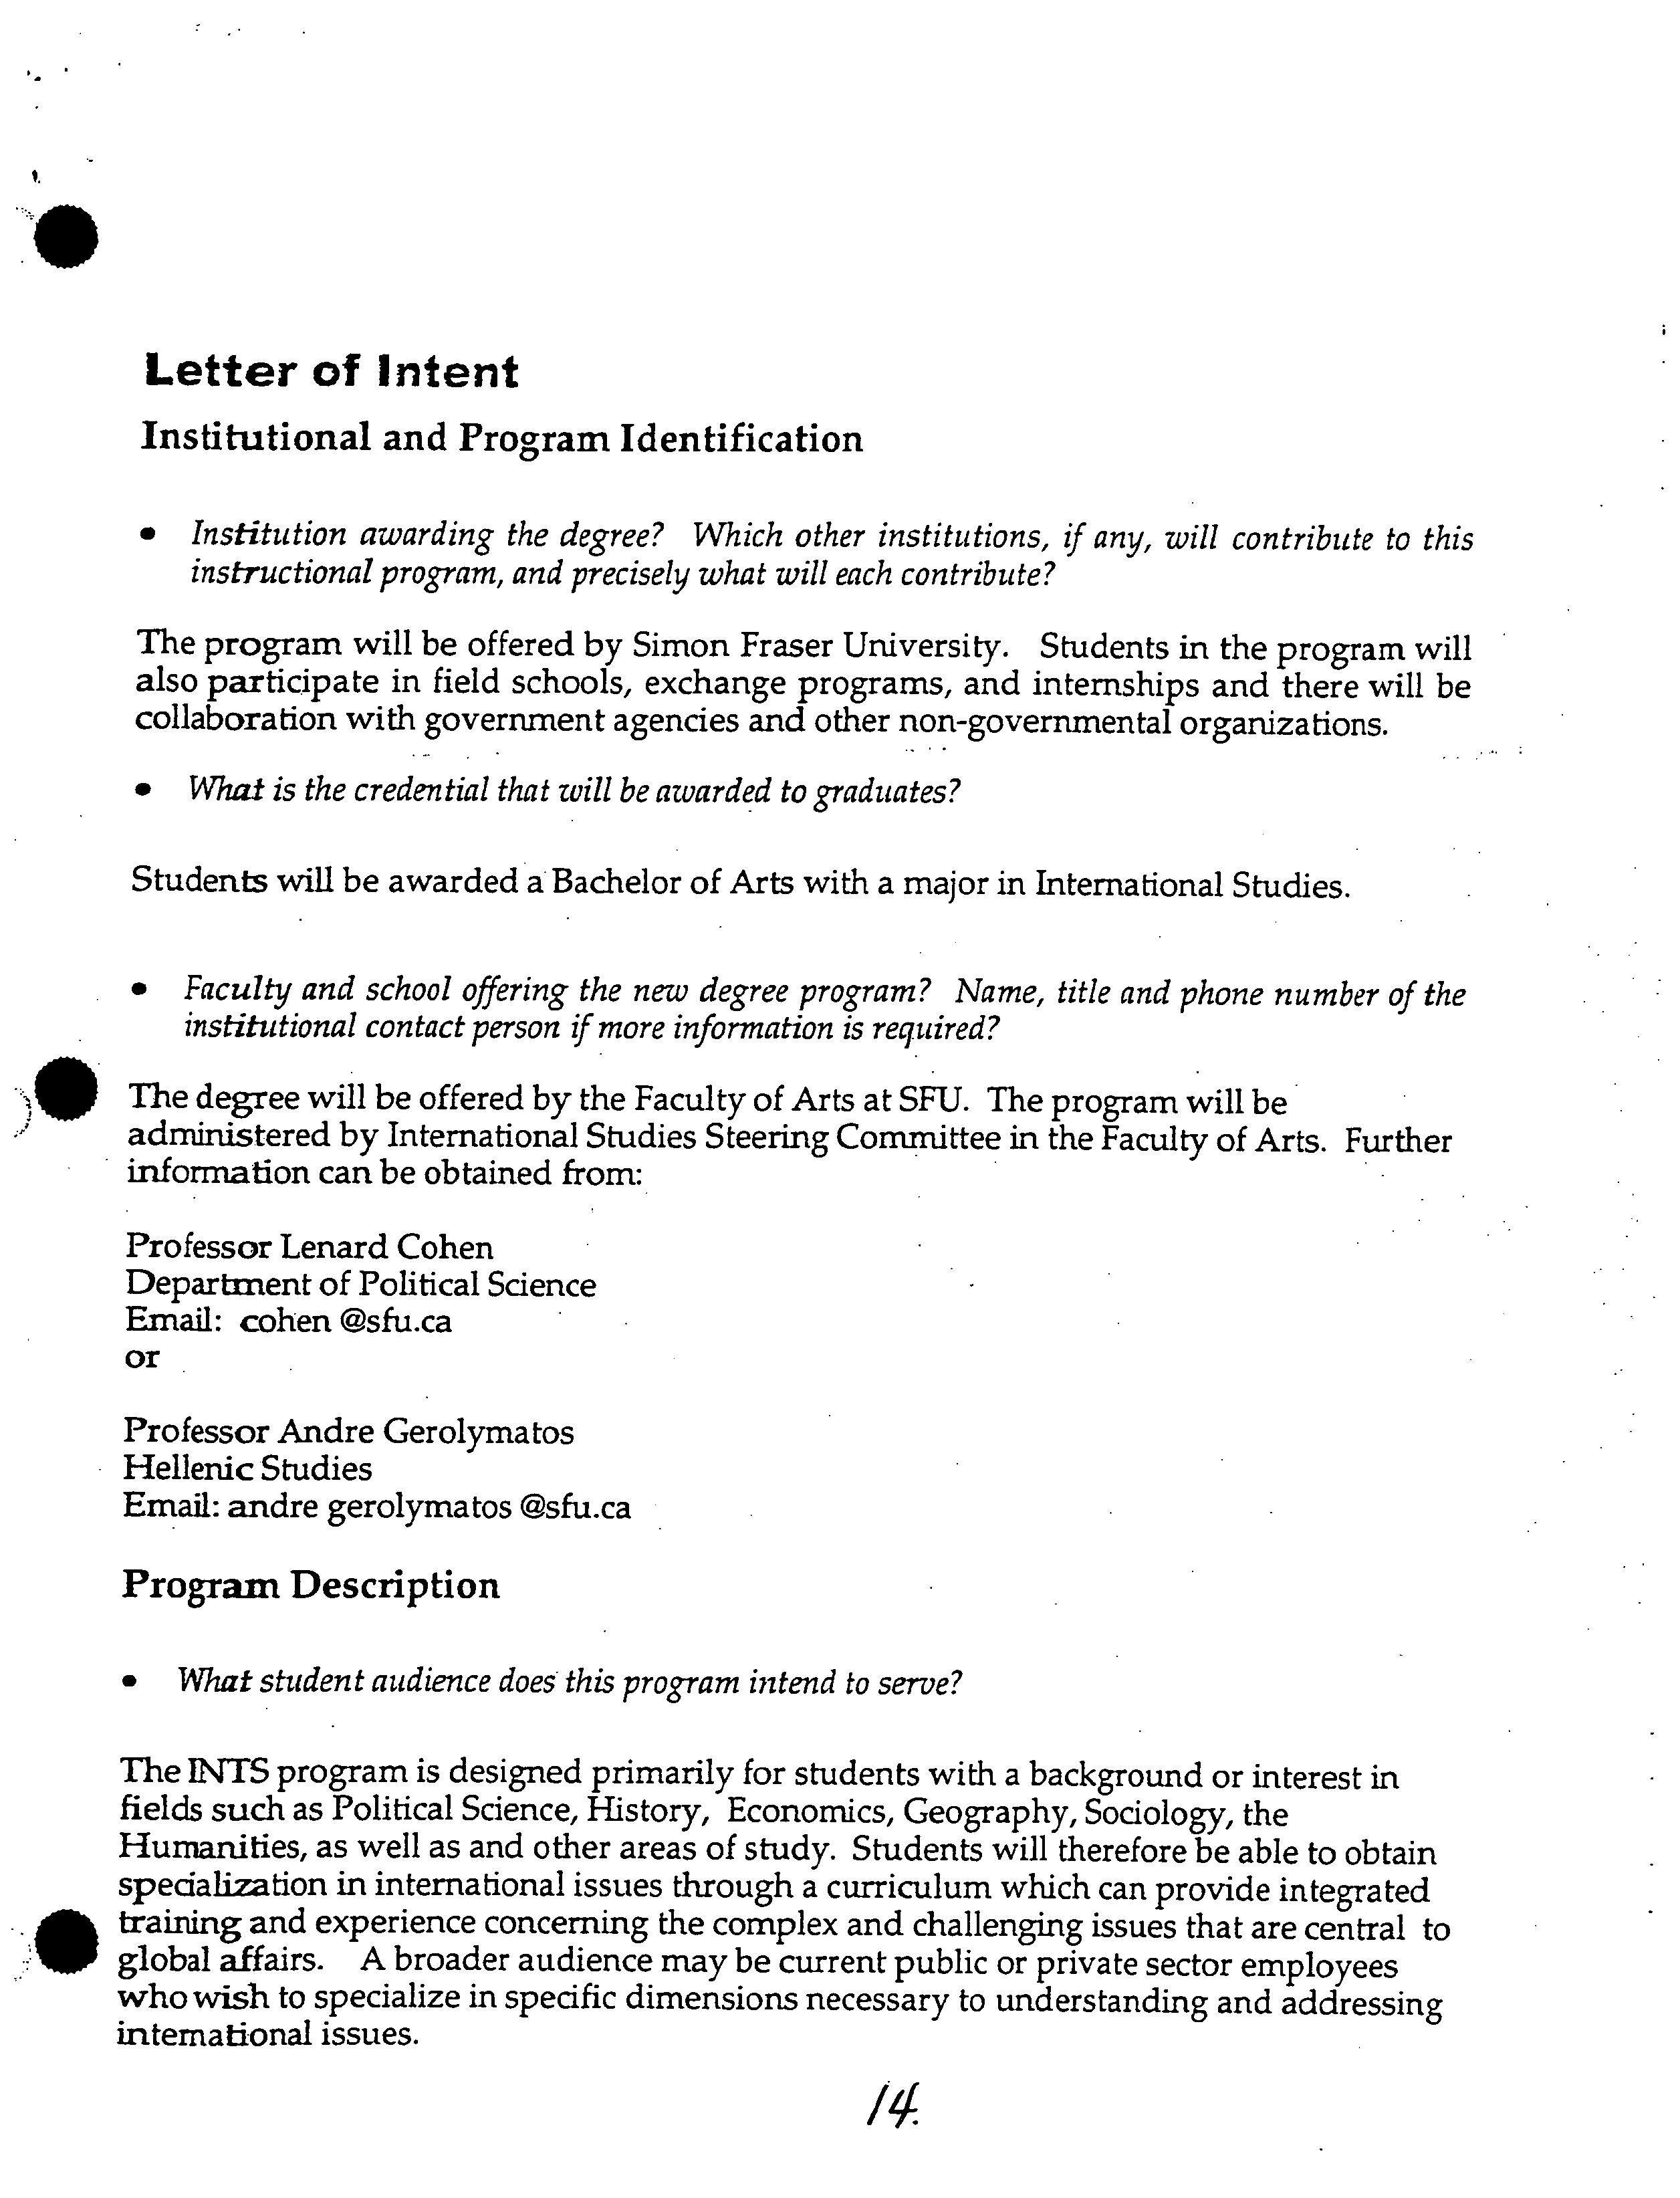 Essay 123 language